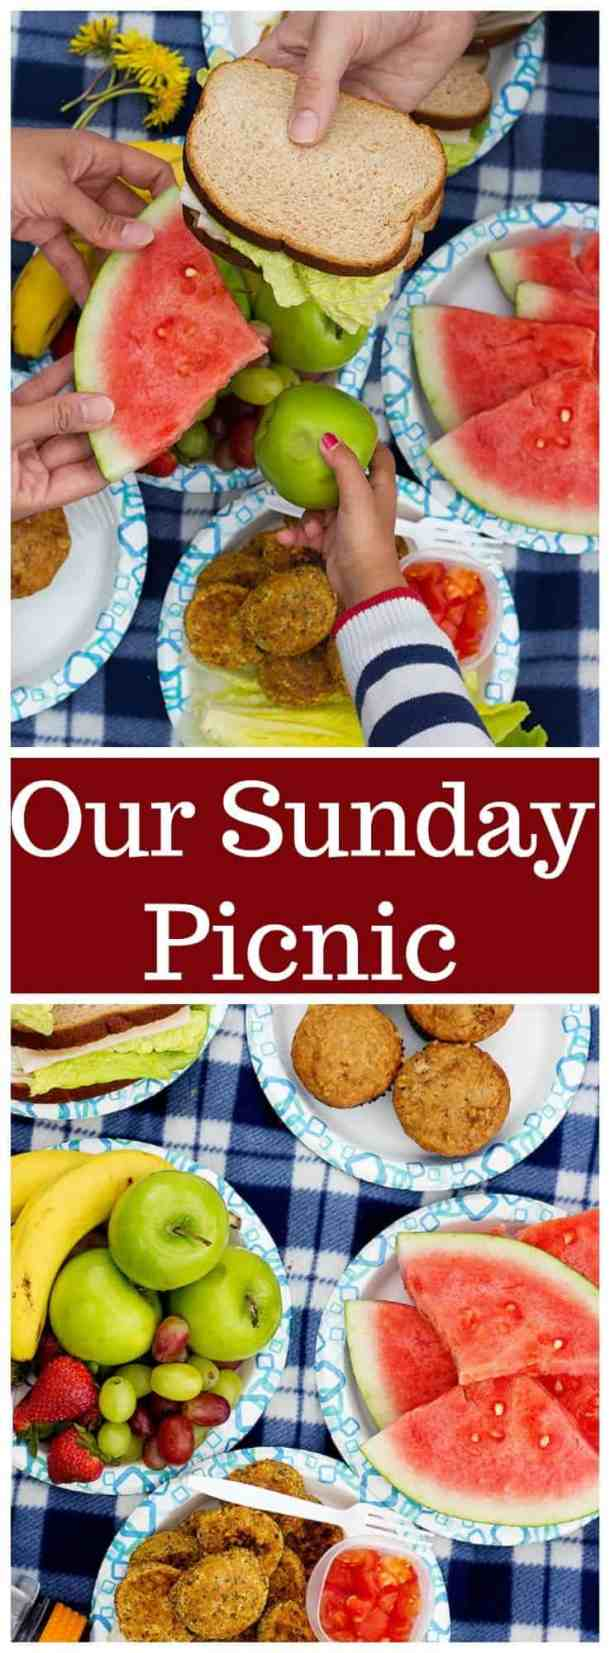 Sunday Picnic | Summer picnic | Spring Picnic | Easy Picnic | Picnic with family | Family Picnic | How to have a mess free picnic | UnicornsintheKitchen.com #picnic #picnicideas #sundaypicnic #summerpicnic